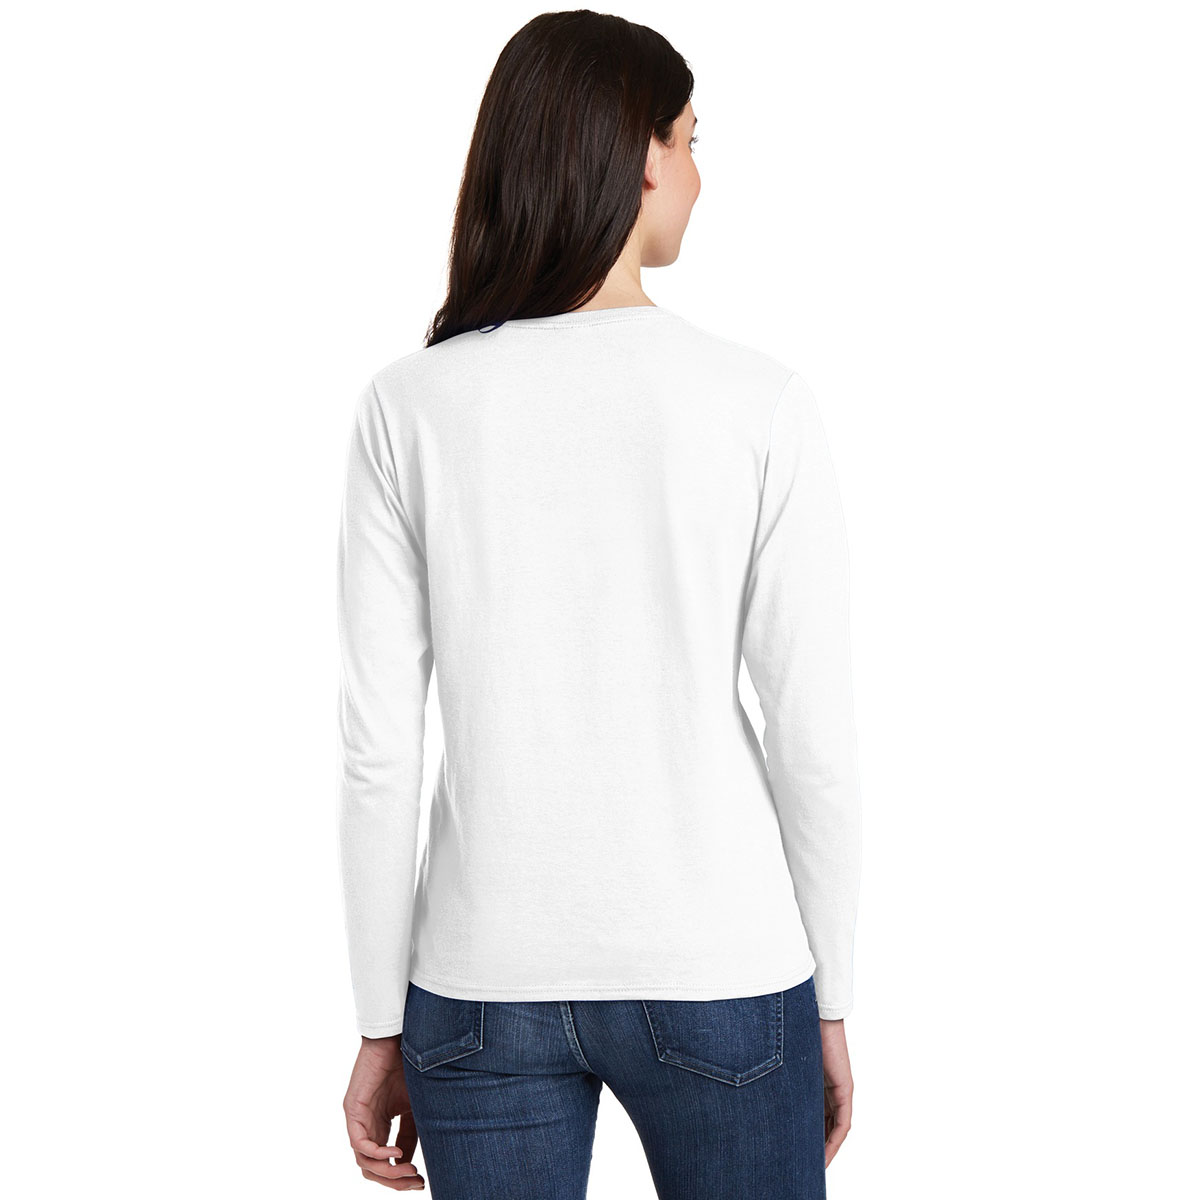 Gildan 5400l ladies heavy cotton long sleeve t shirt for White long sleeve tee shirt womens